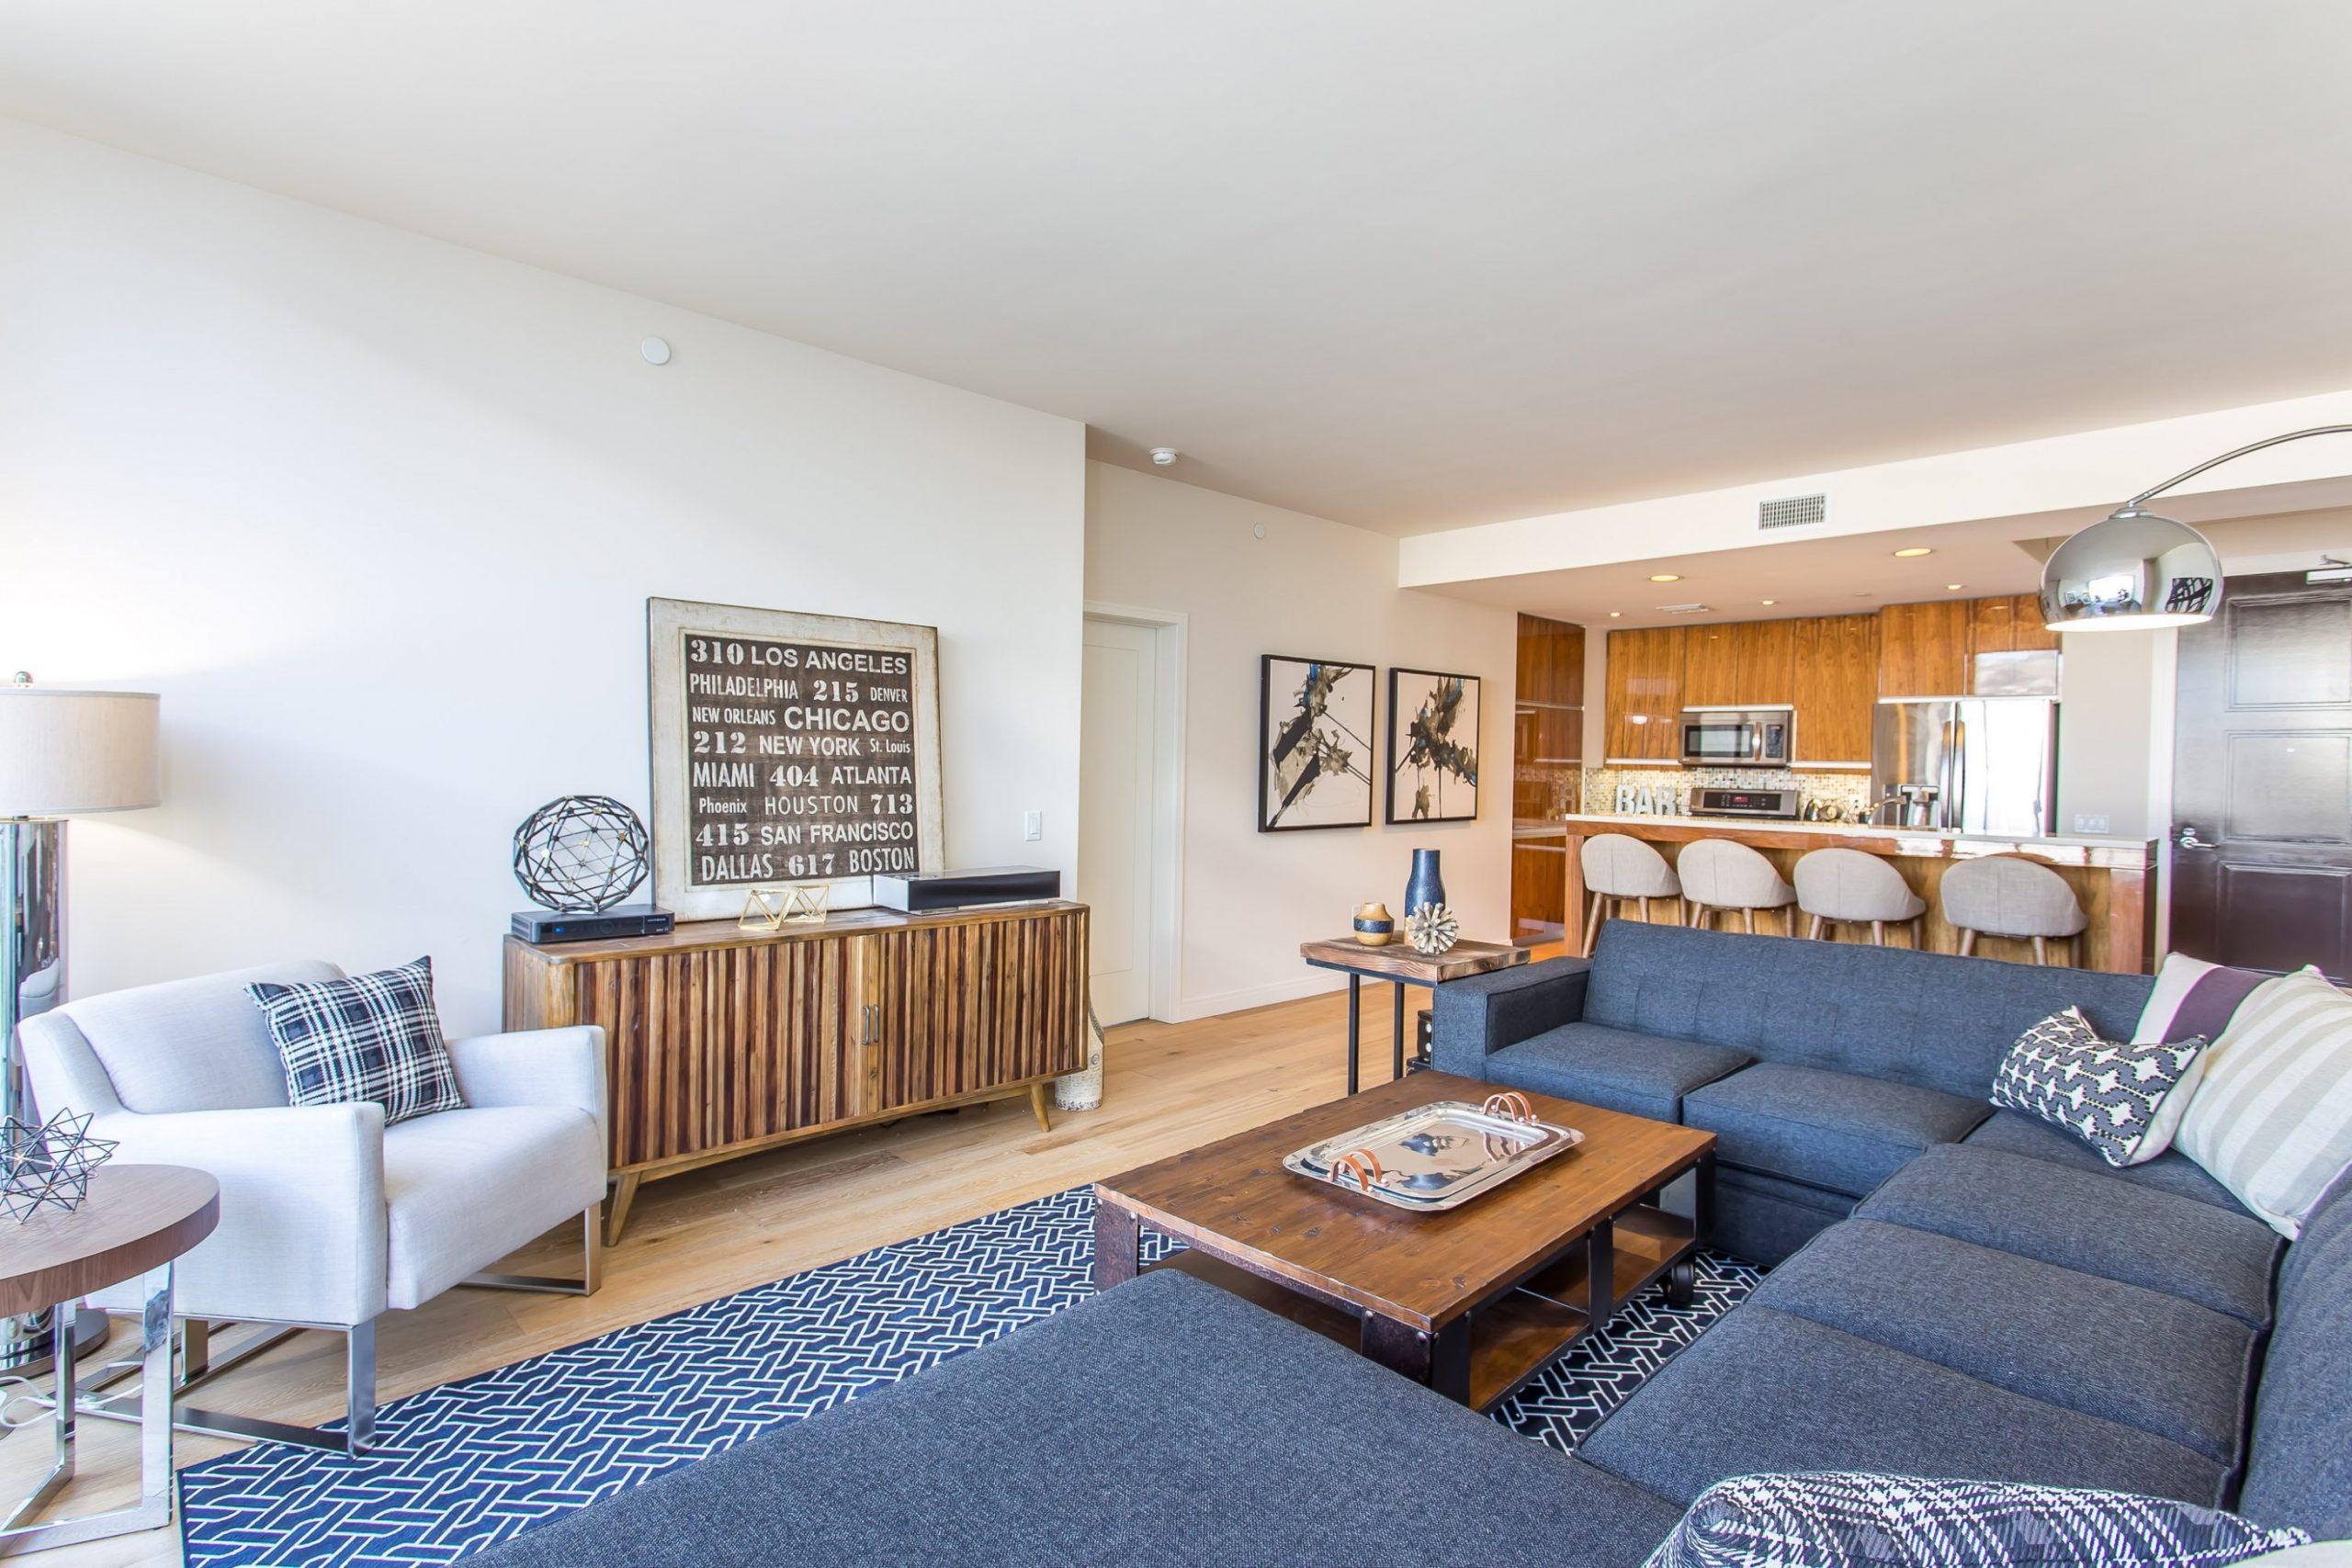 Apartment Decorating Ideas: 12 Ways to Transform Your Cookie-Cutter  - Apartment Decorating Ideas Ideas